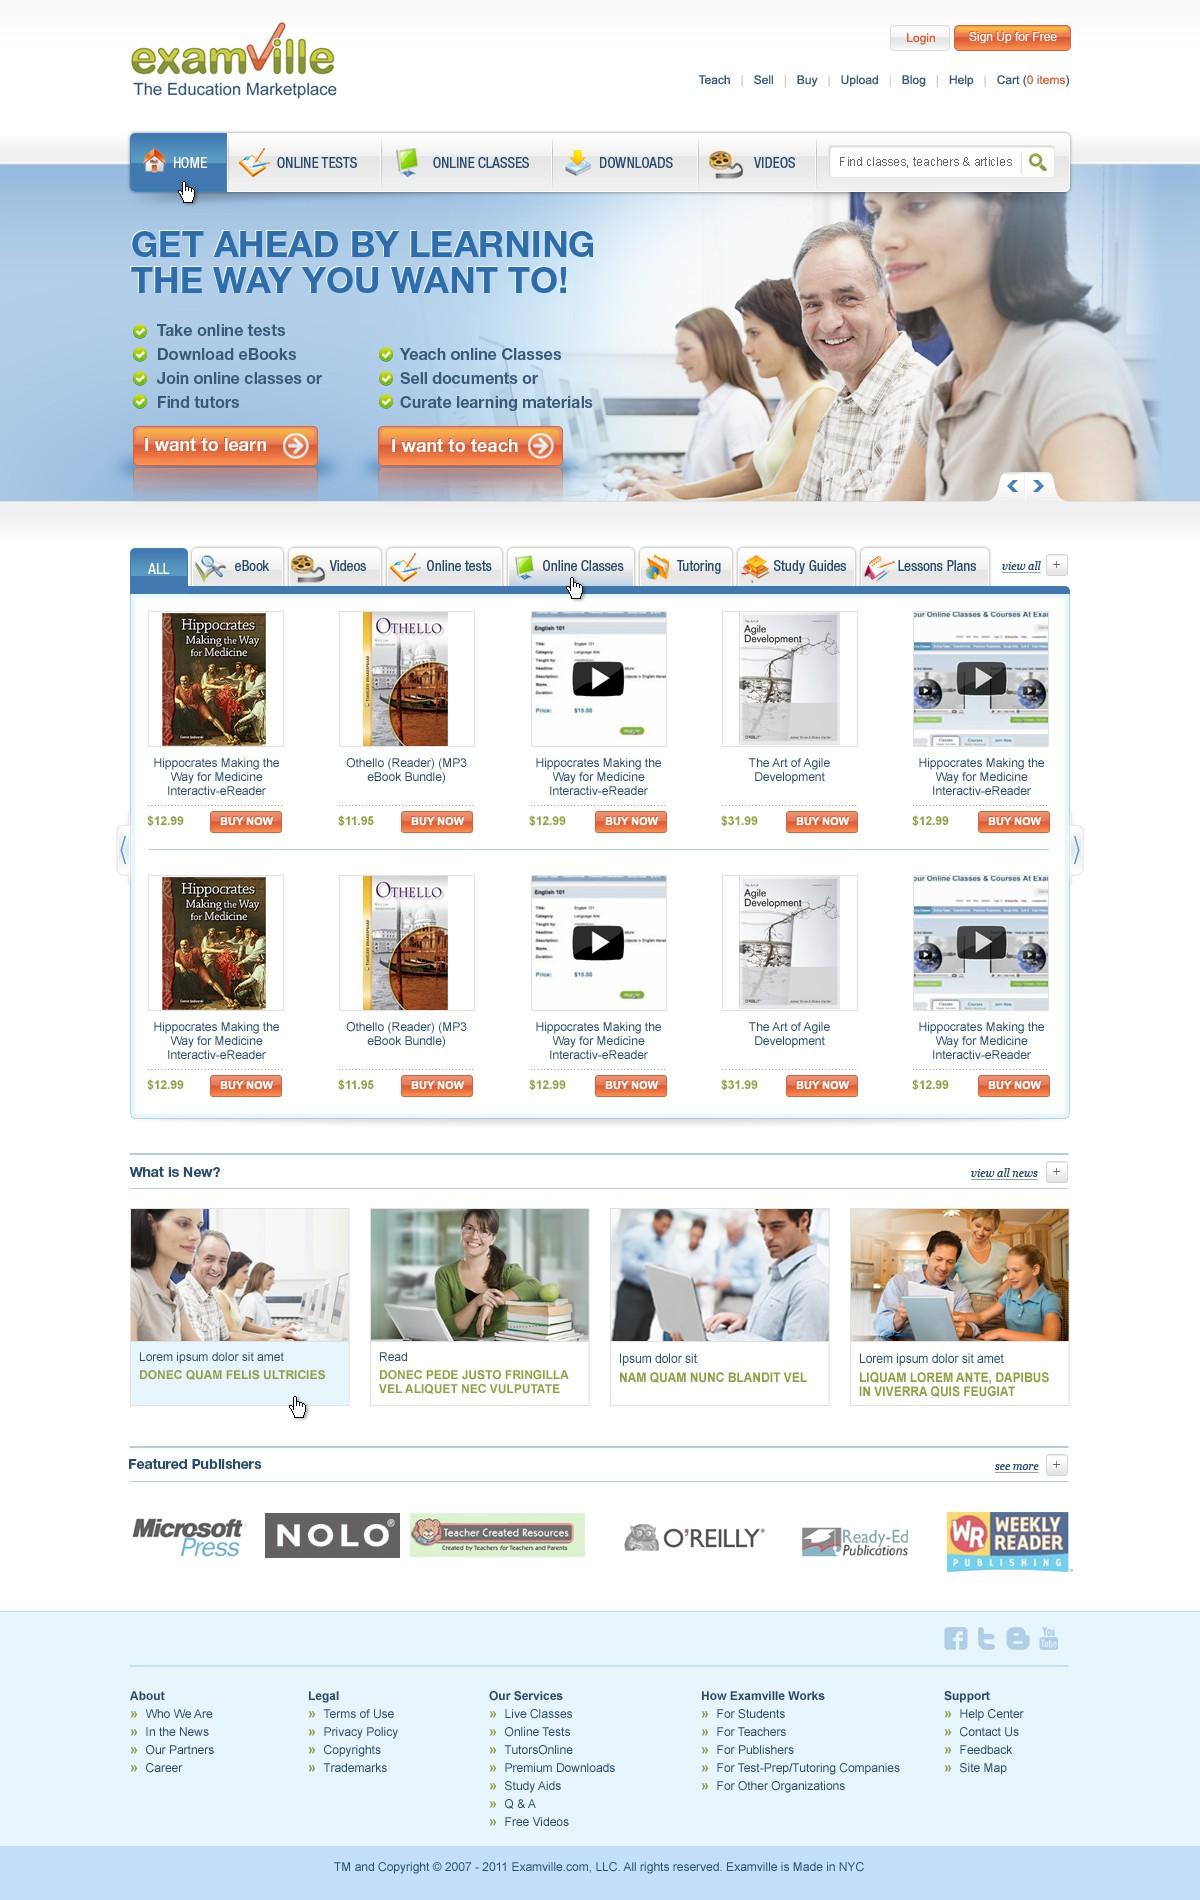 Examville needs a new website design - Money Guaranteed to the winner!